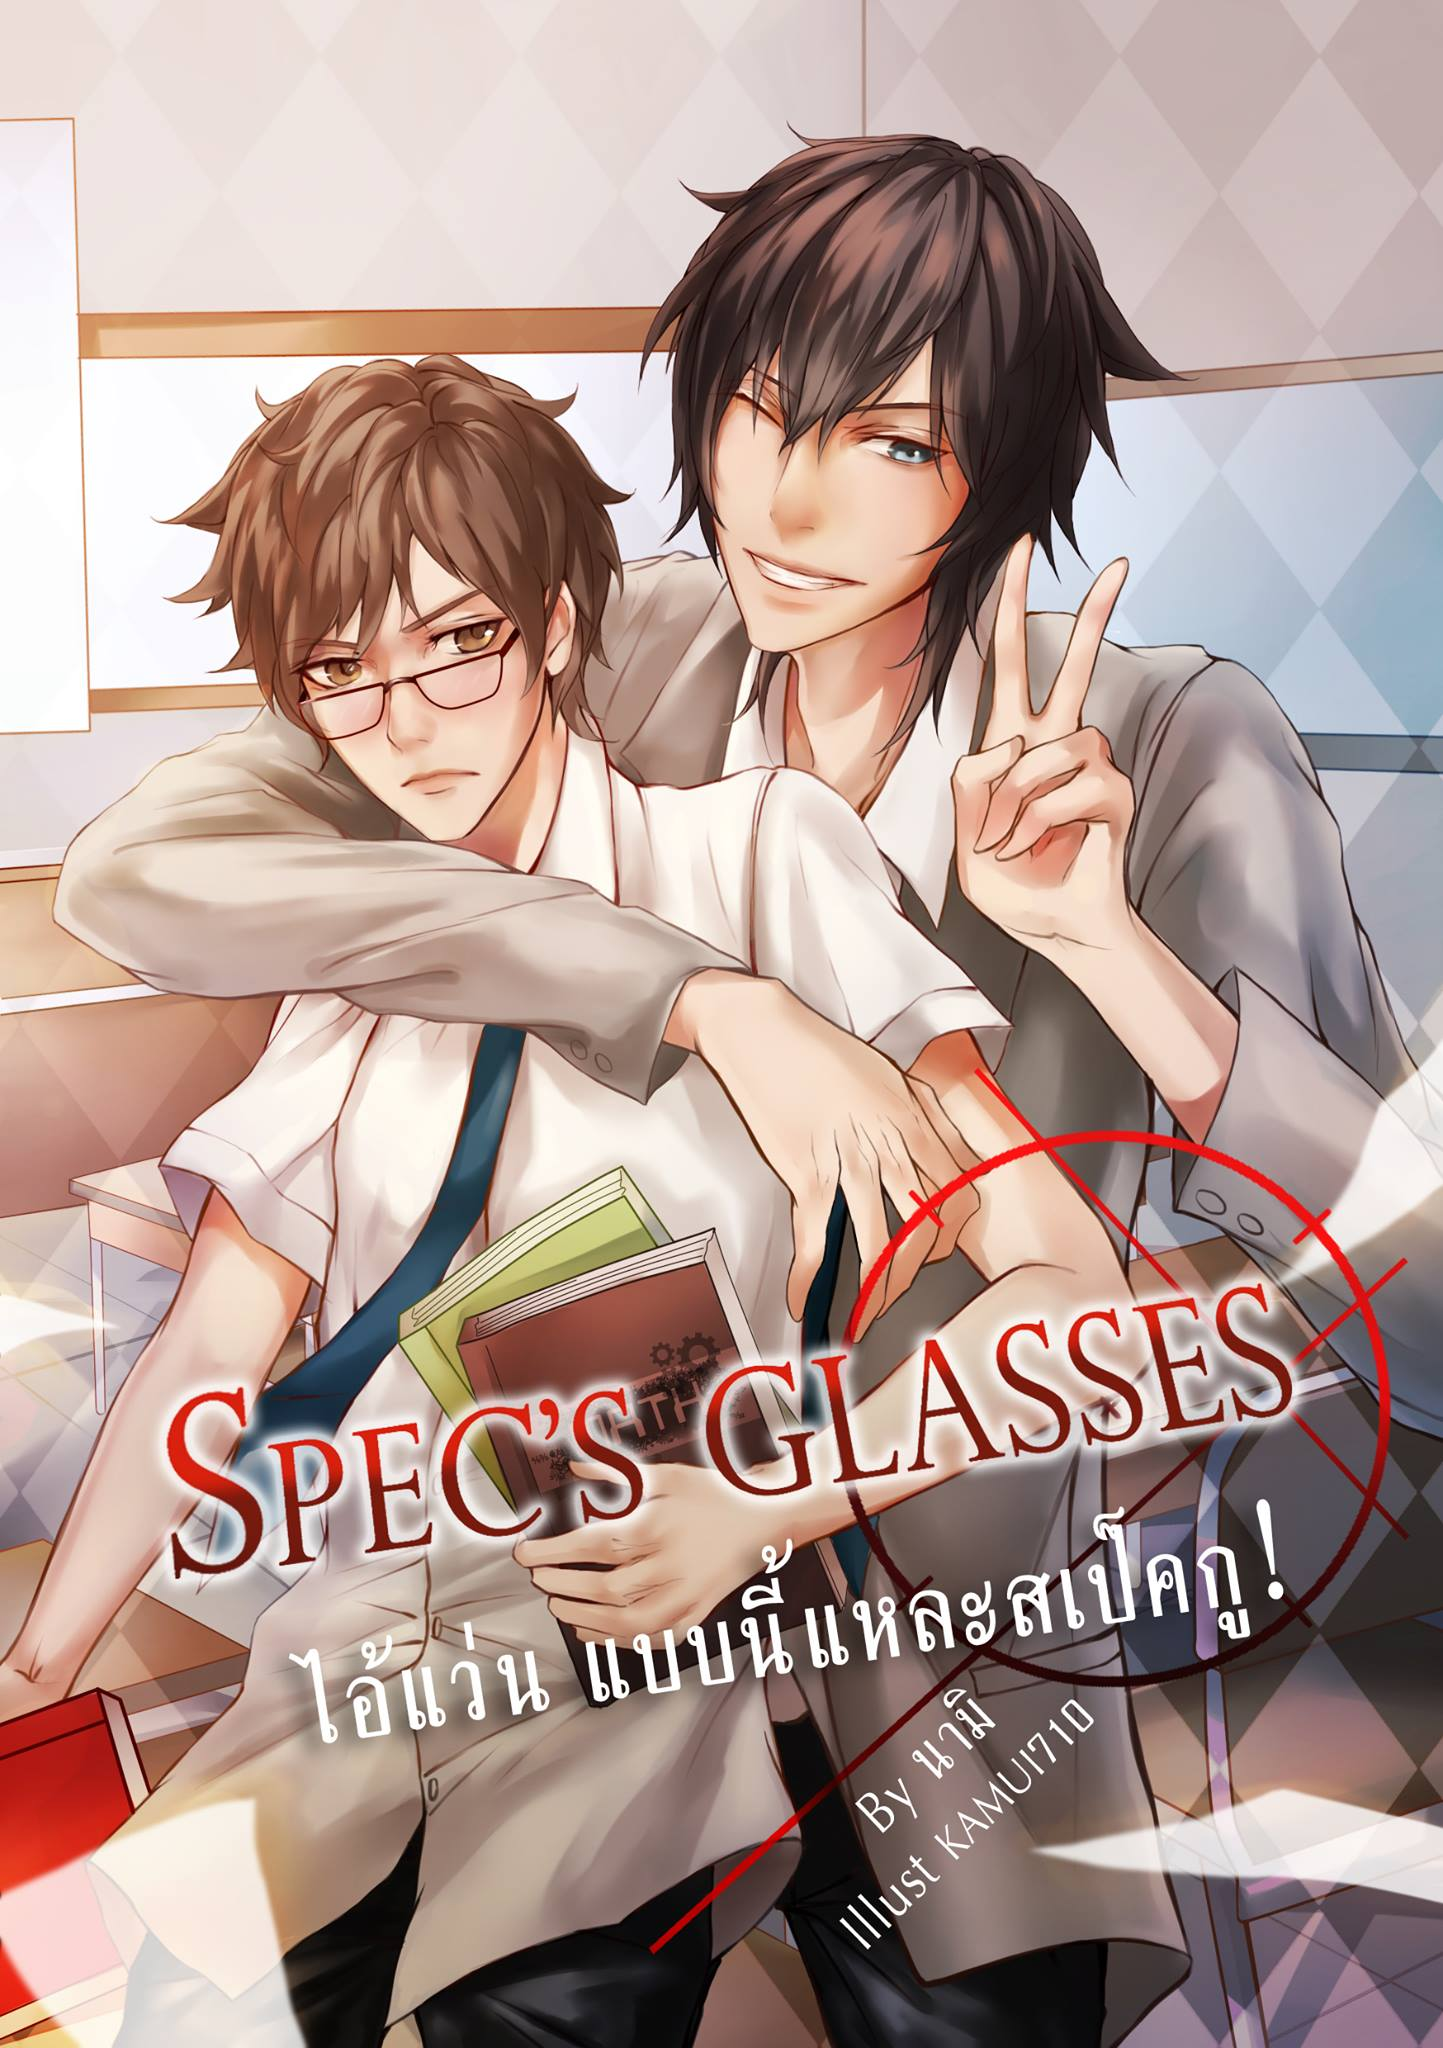 [Pre Order] SPEC'S GLASSES ไอ้แว่น แบบนี้แหละสเป็คกู BY นามิ แบบไปรษณีย์